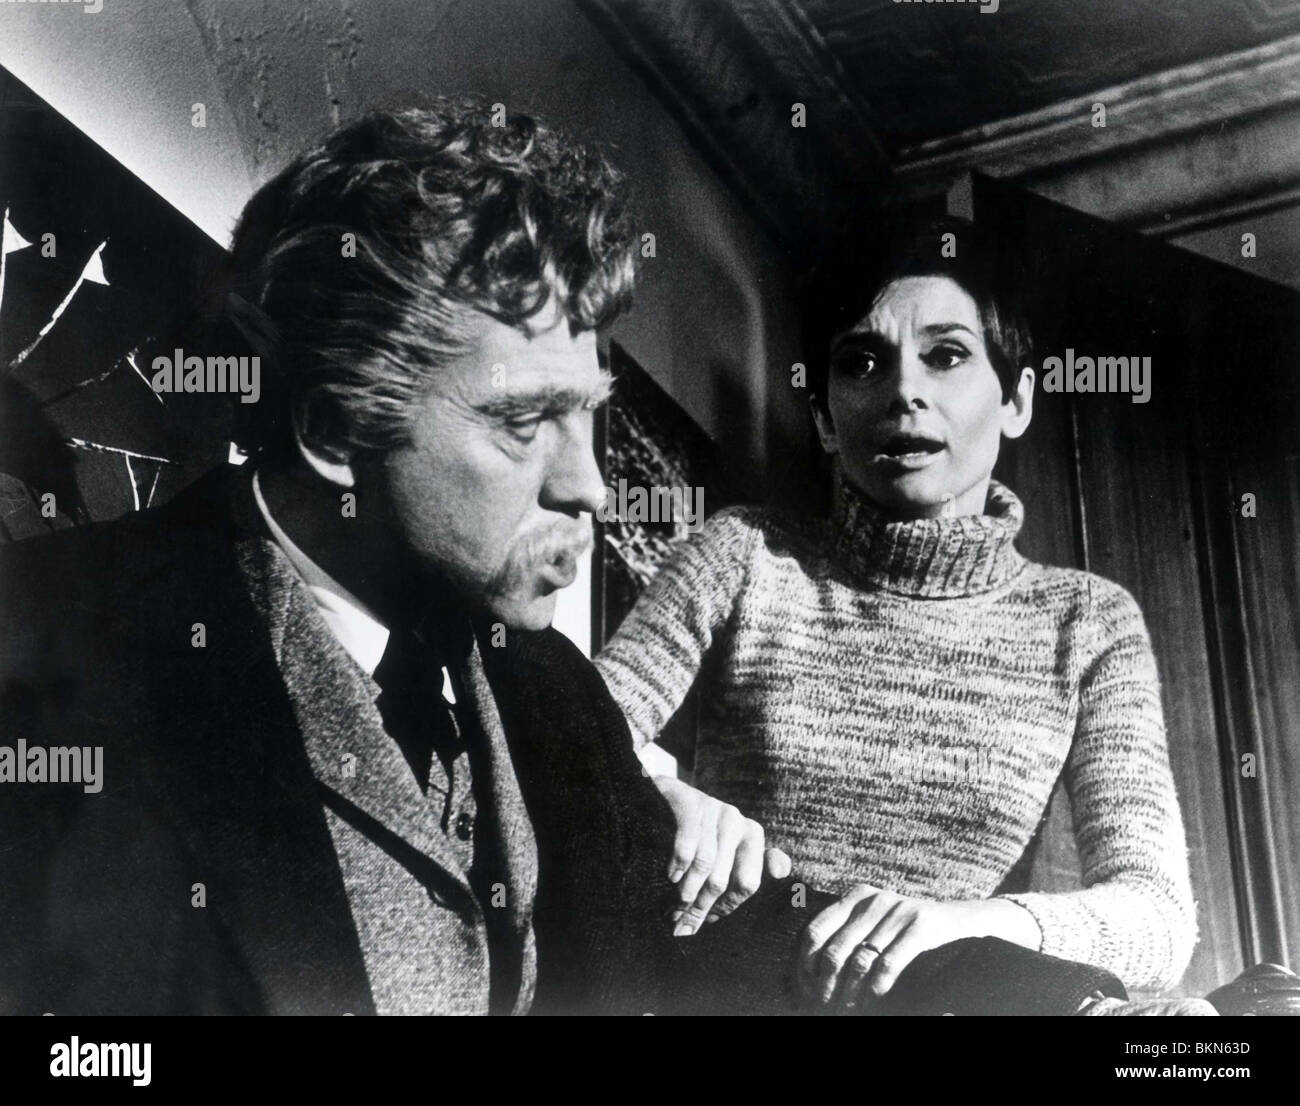 WAIT UNTIL DARK (1967) AUDREY HEPBURN WUDA 003P - Stock Image